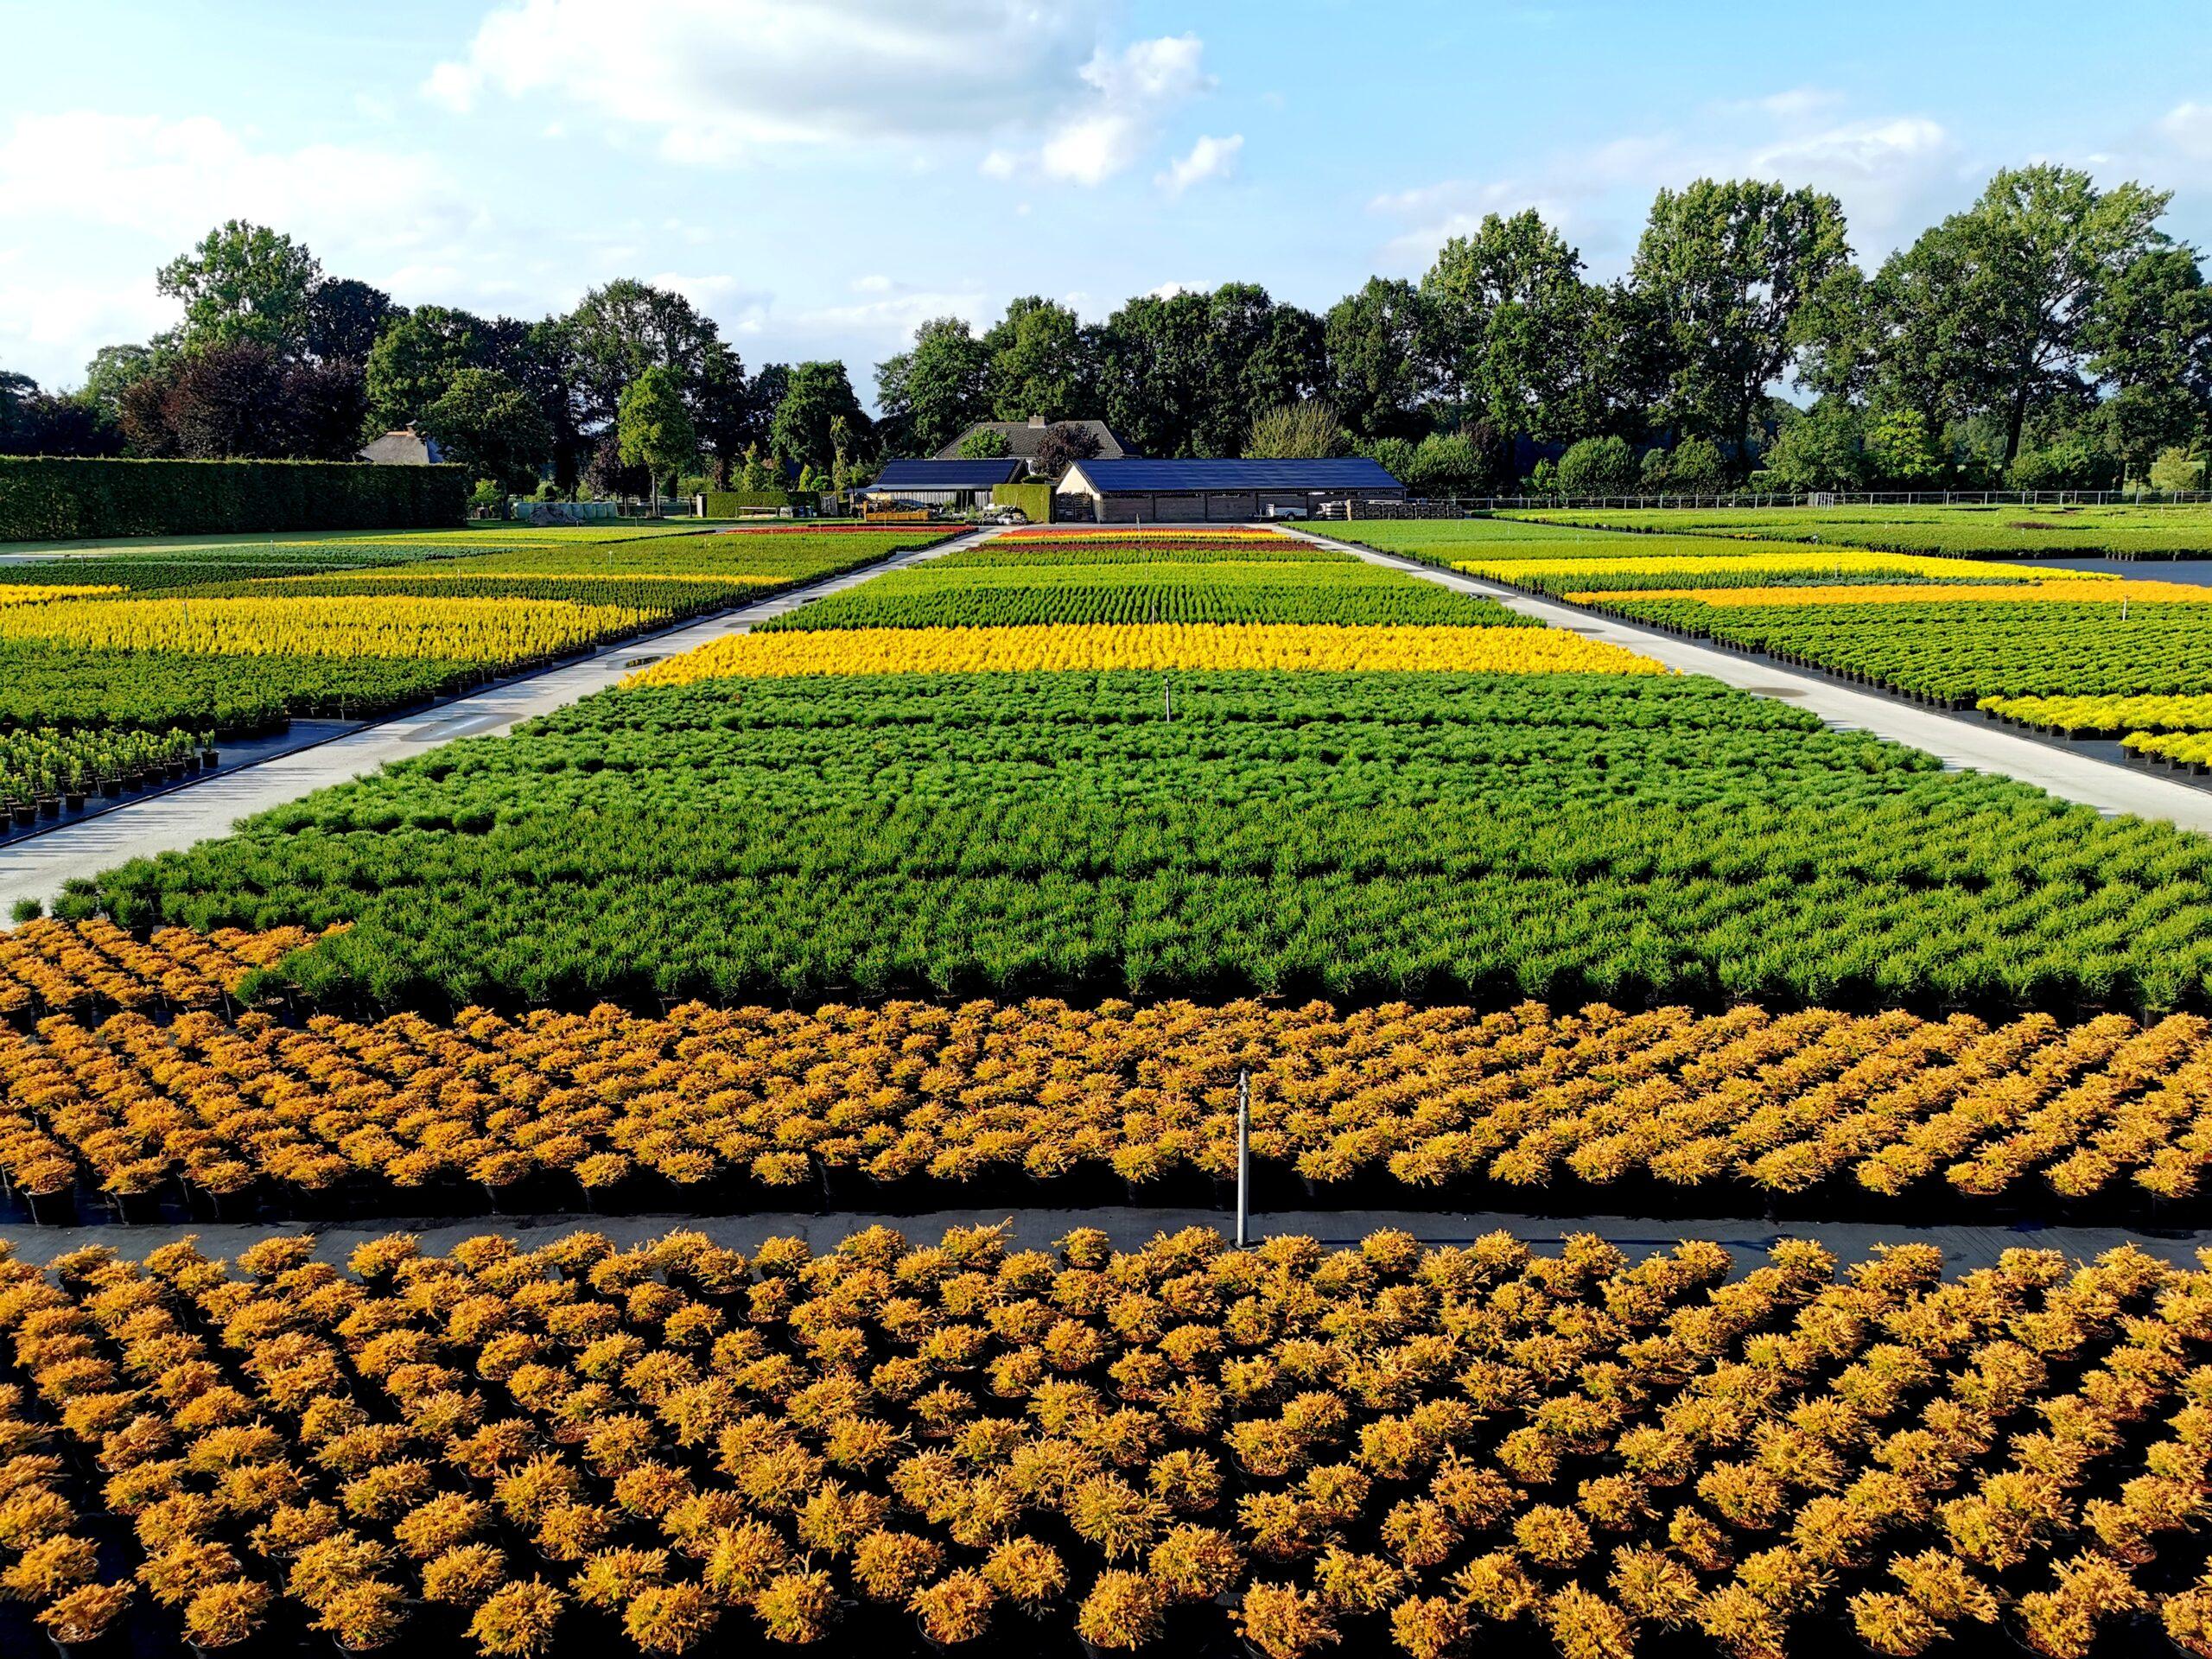 Kwekerij-coniferen-zomer-scaled